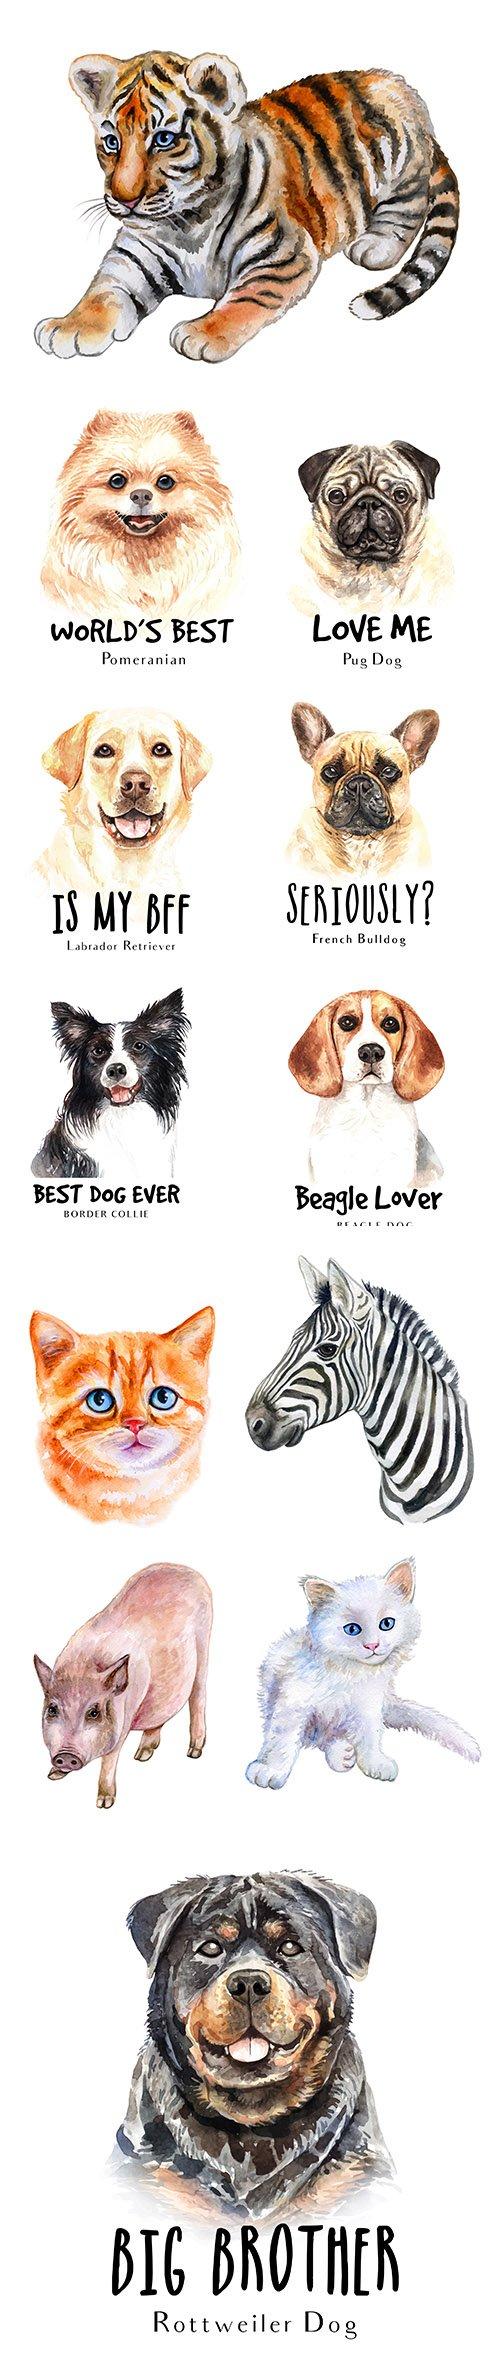 Watercolor Printing Animals Vol 6